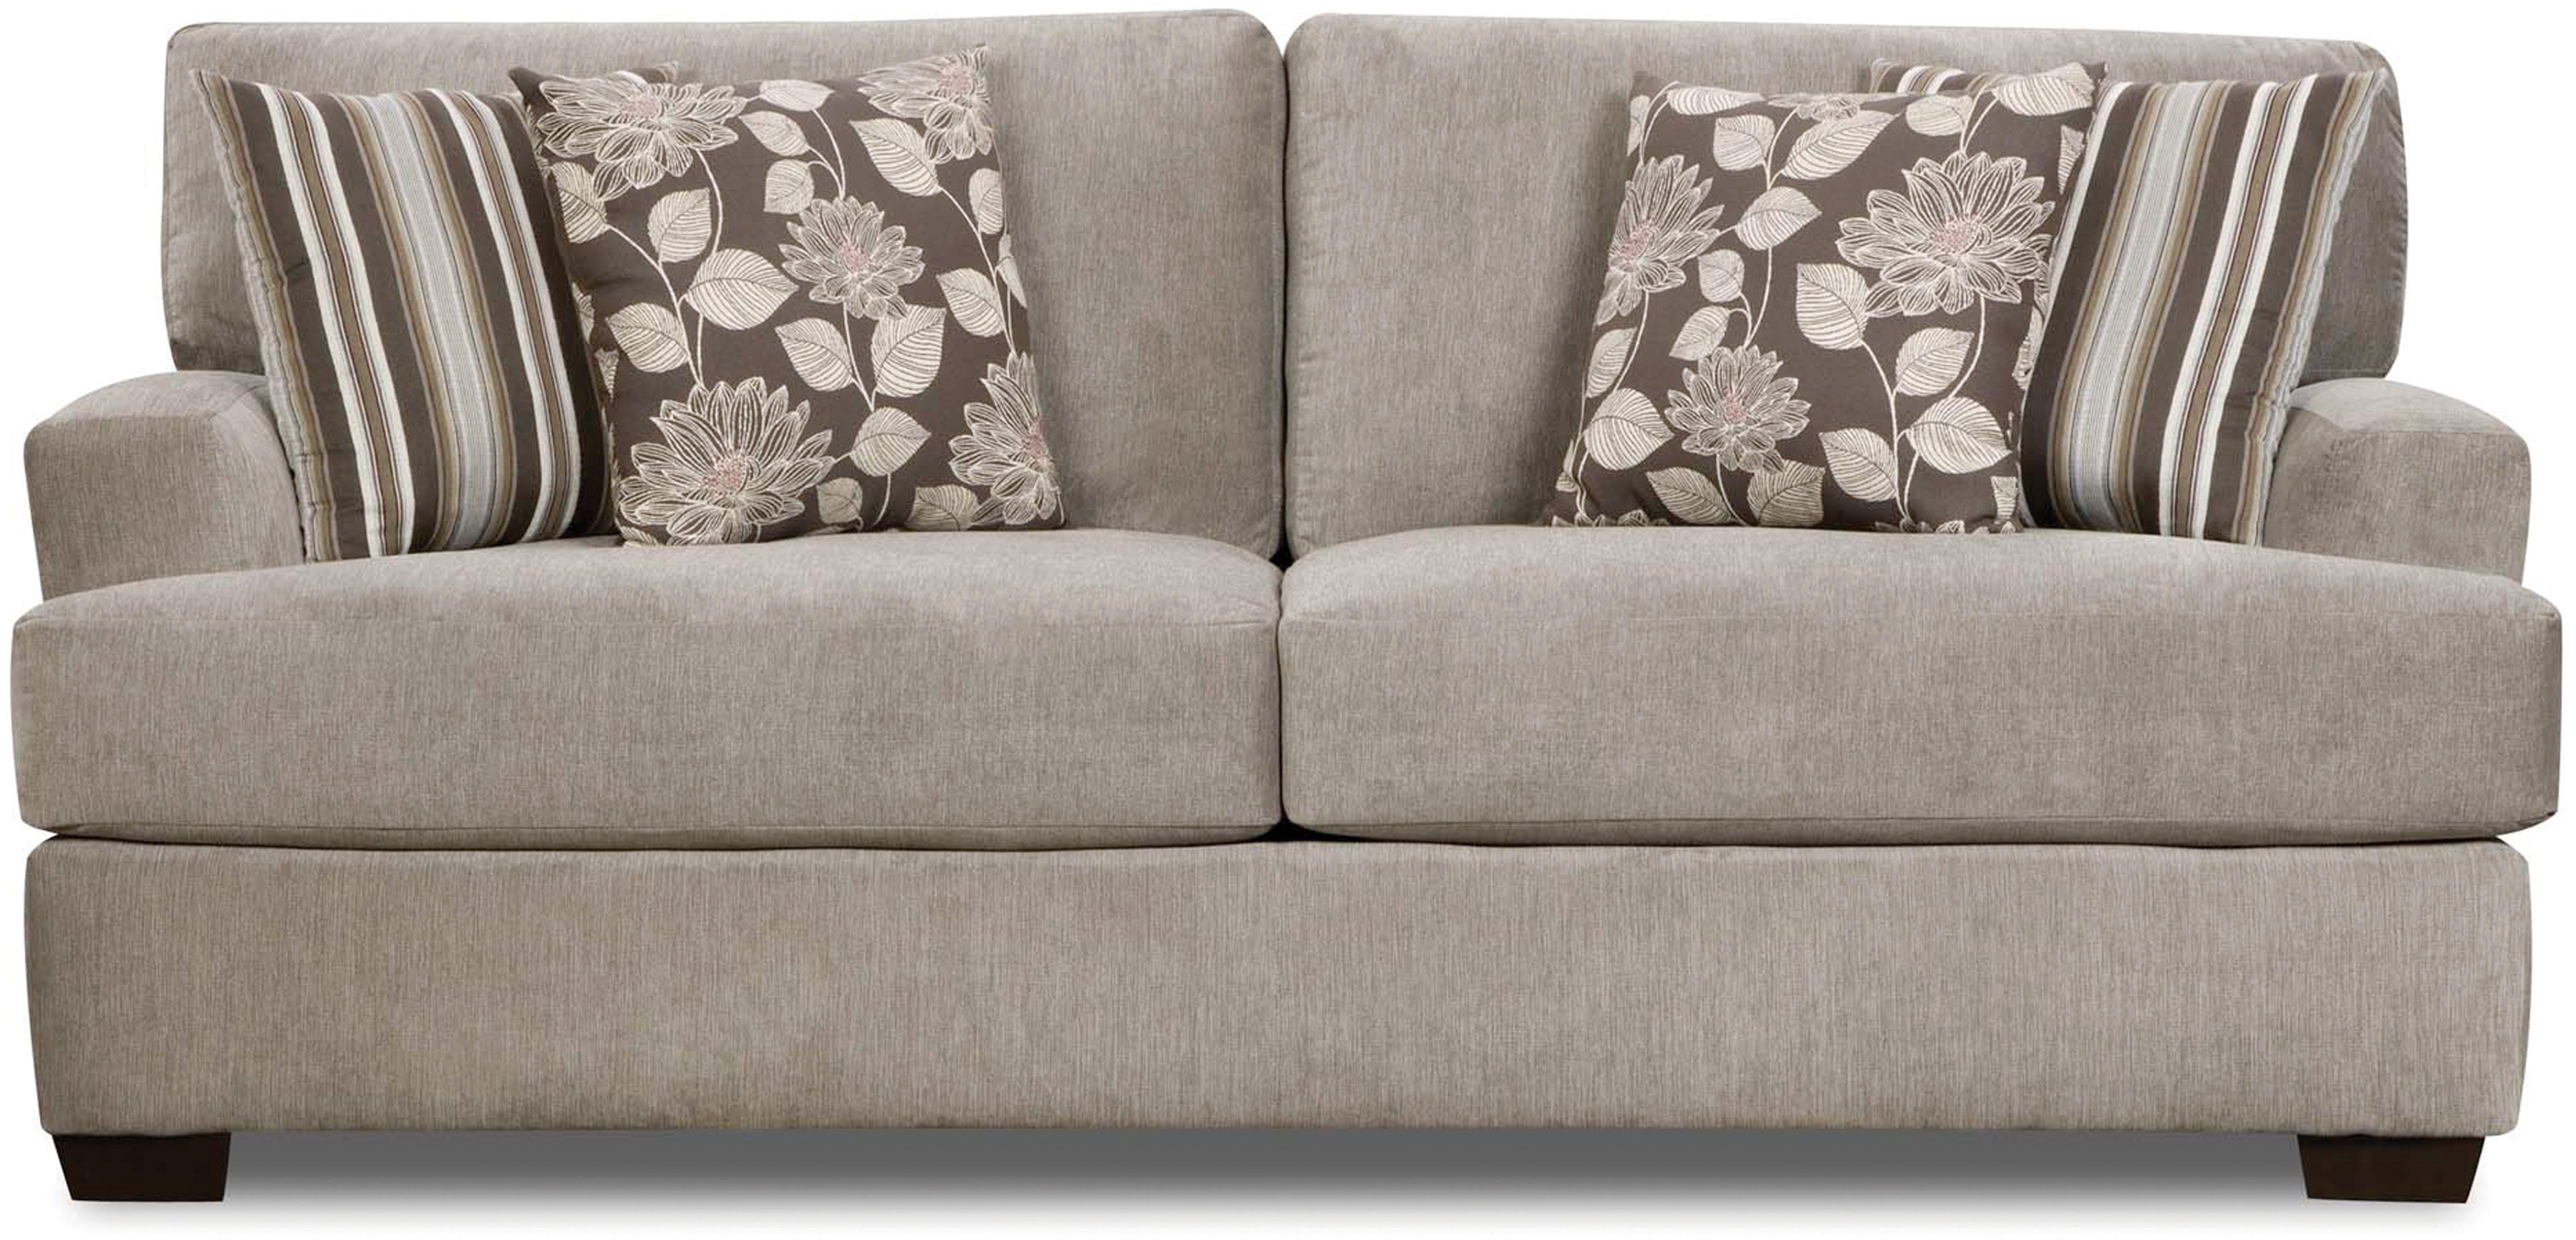 Corinthian Josephine Seal Sofa 041524 Front Room Furnishings Leather Sofa Standard Furniture